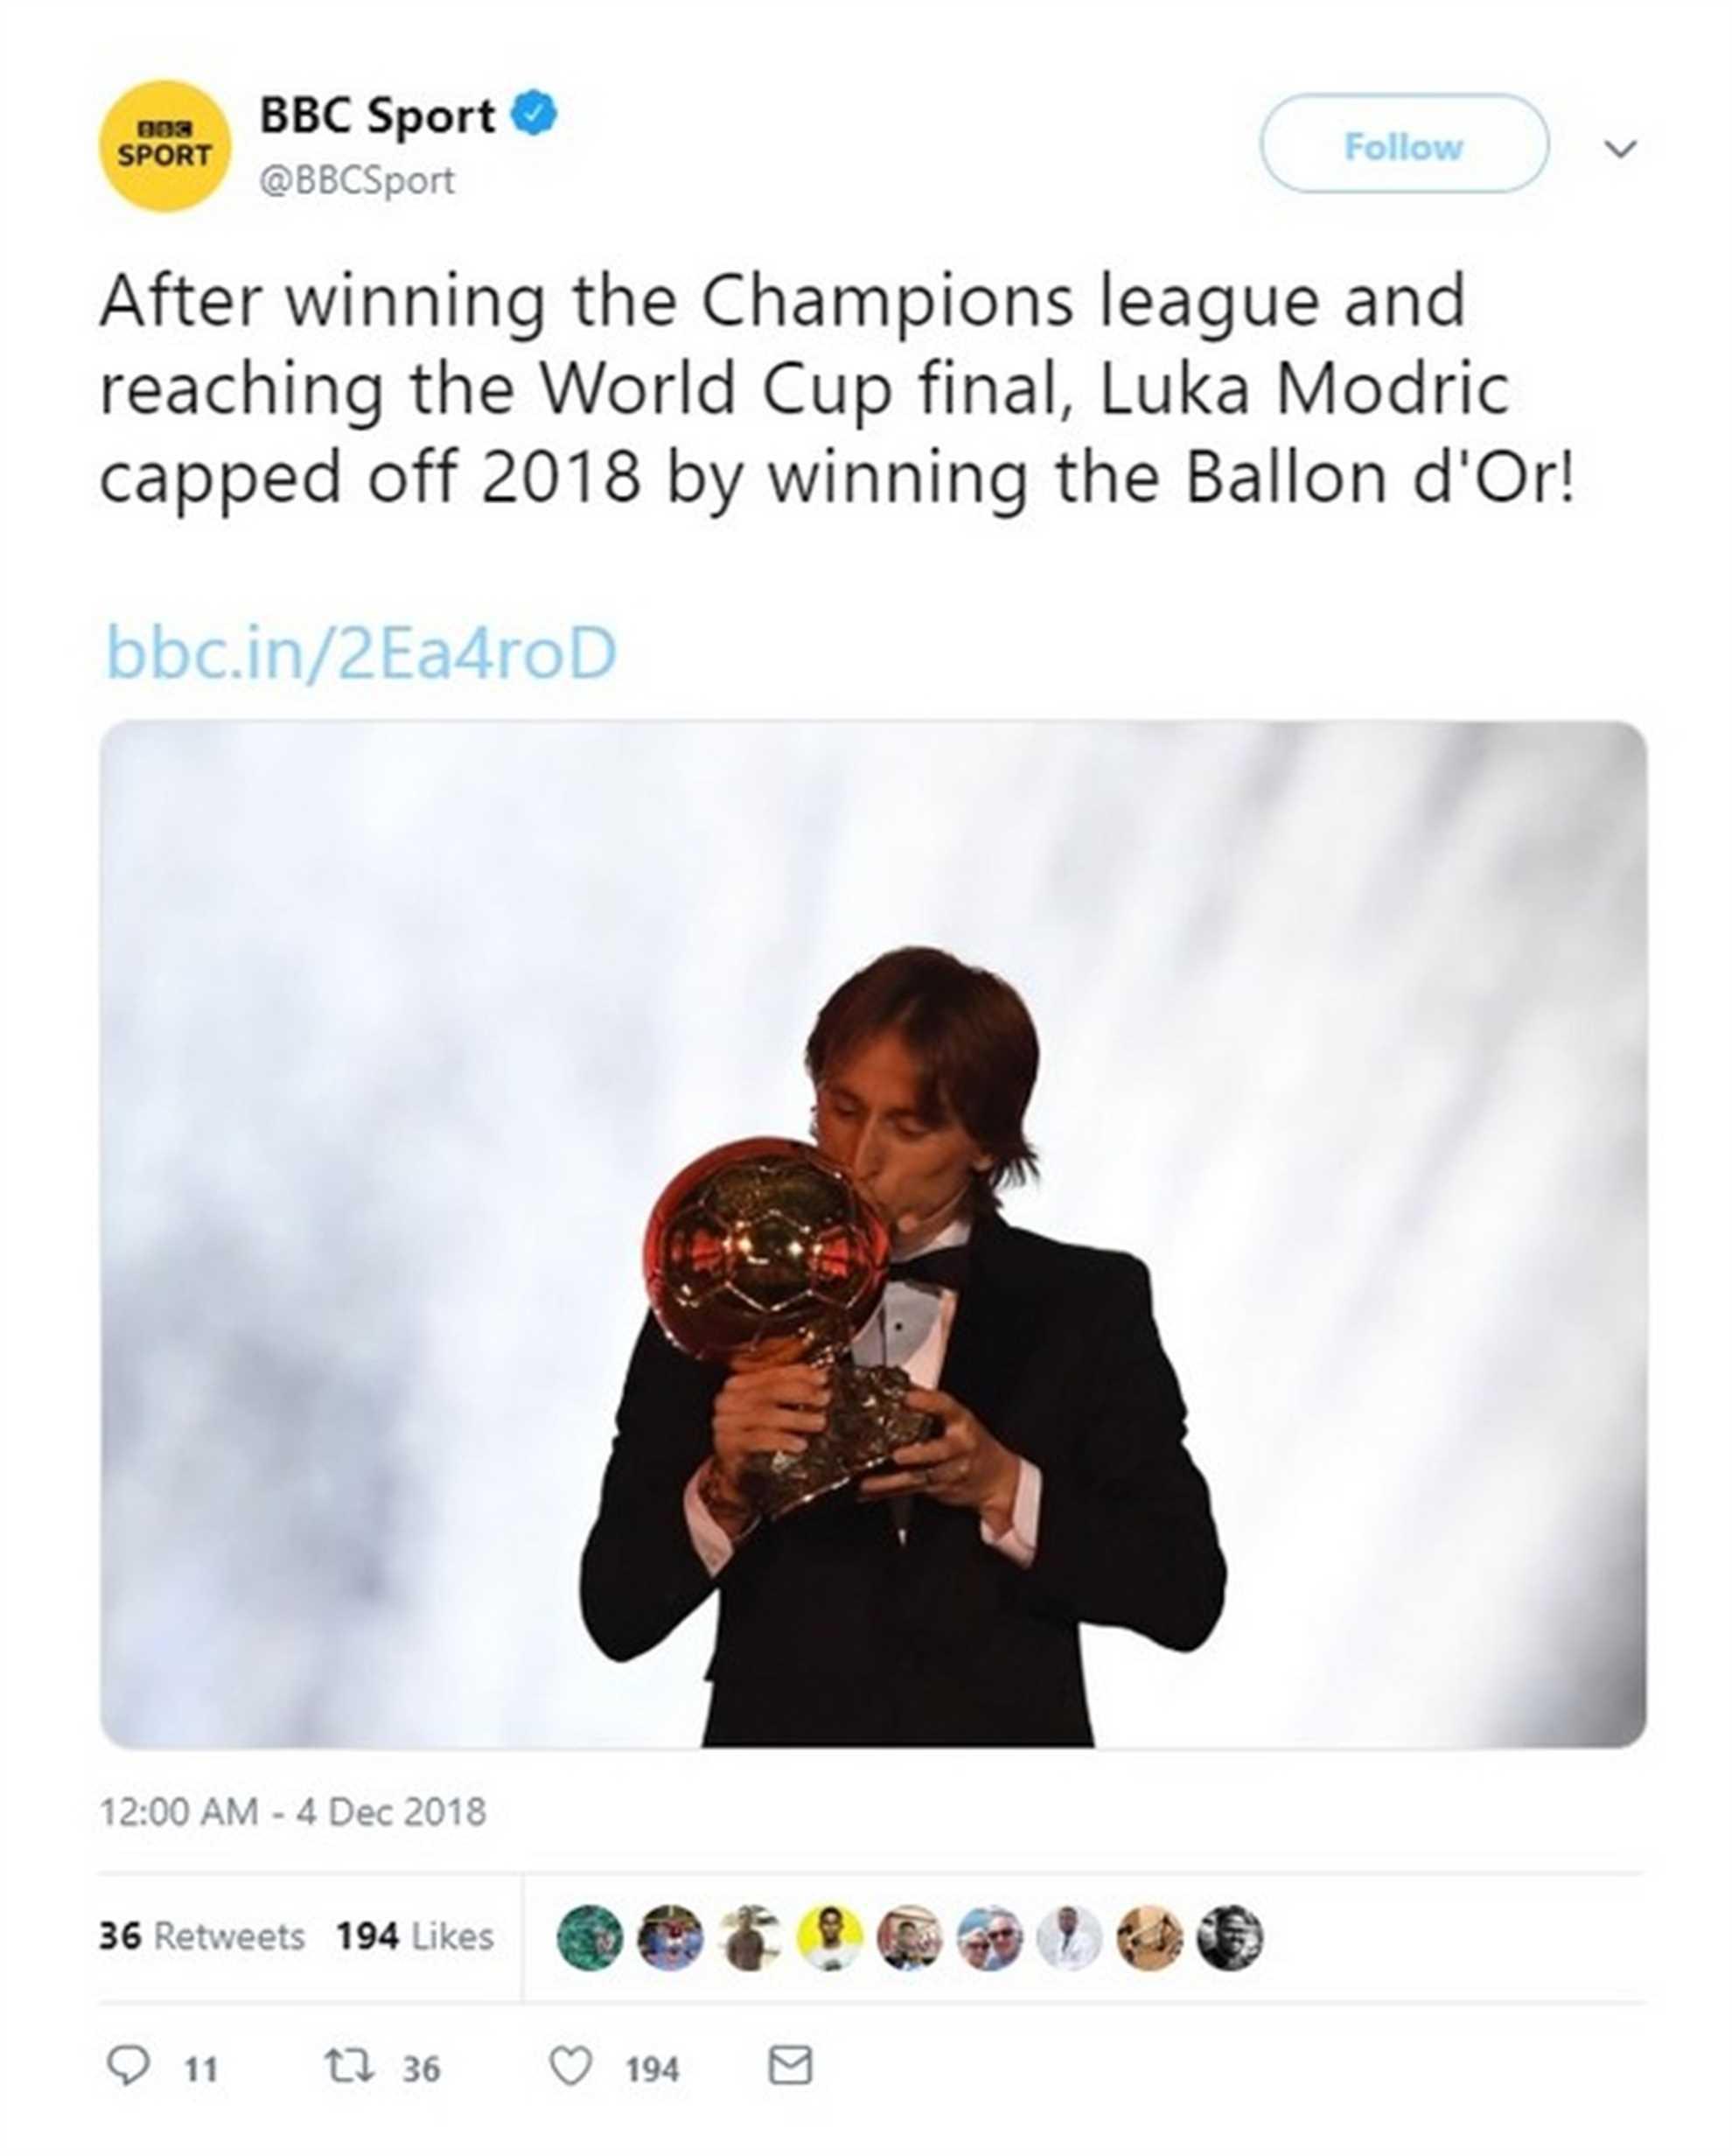 BBC Sport tweets about Luka Modric